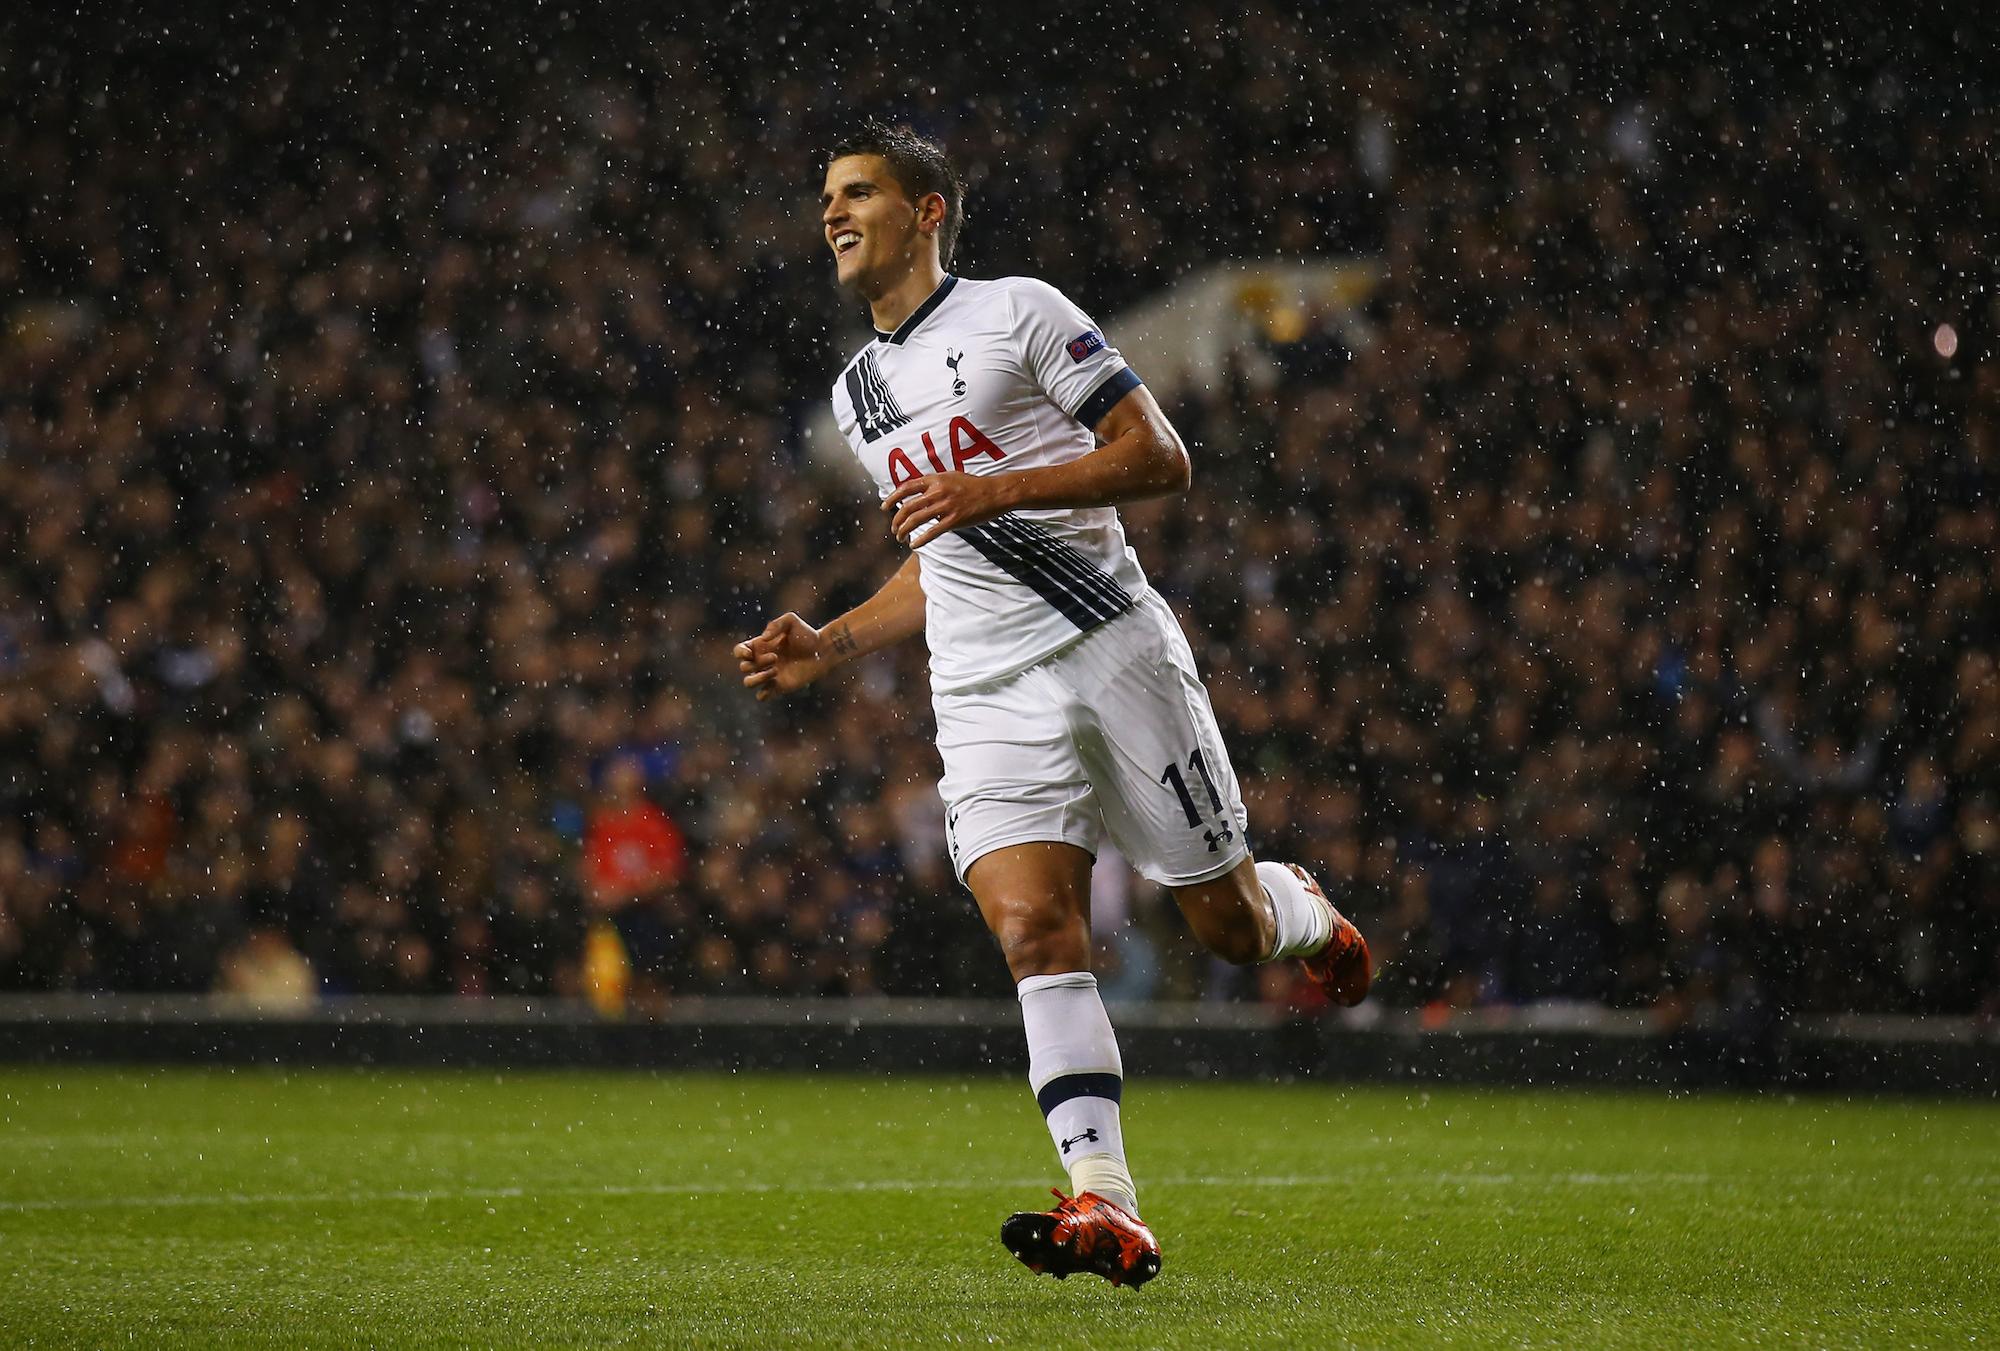 Erik Lamela, 5 gol in quest'edizione di Europa League con il Tottenham